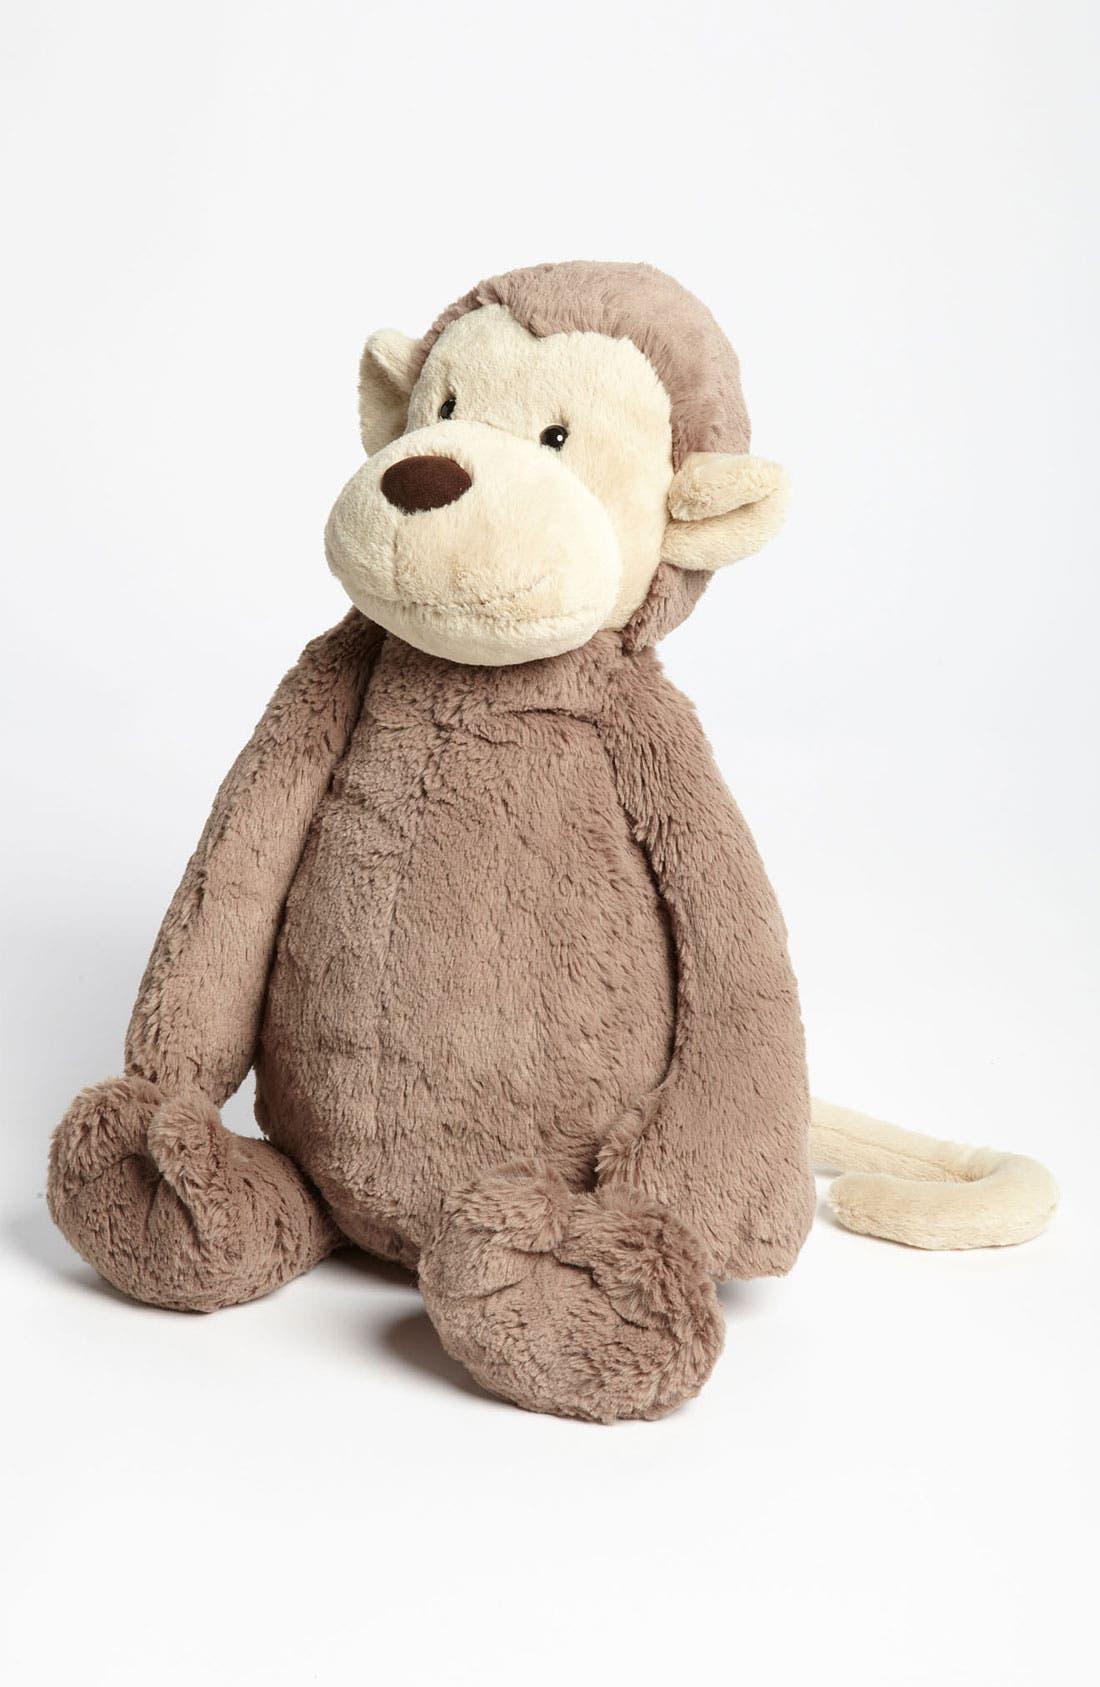 Alternate Image 1 Selected - Jellycat 'Large Bashful Monkey' Stuffed Animal